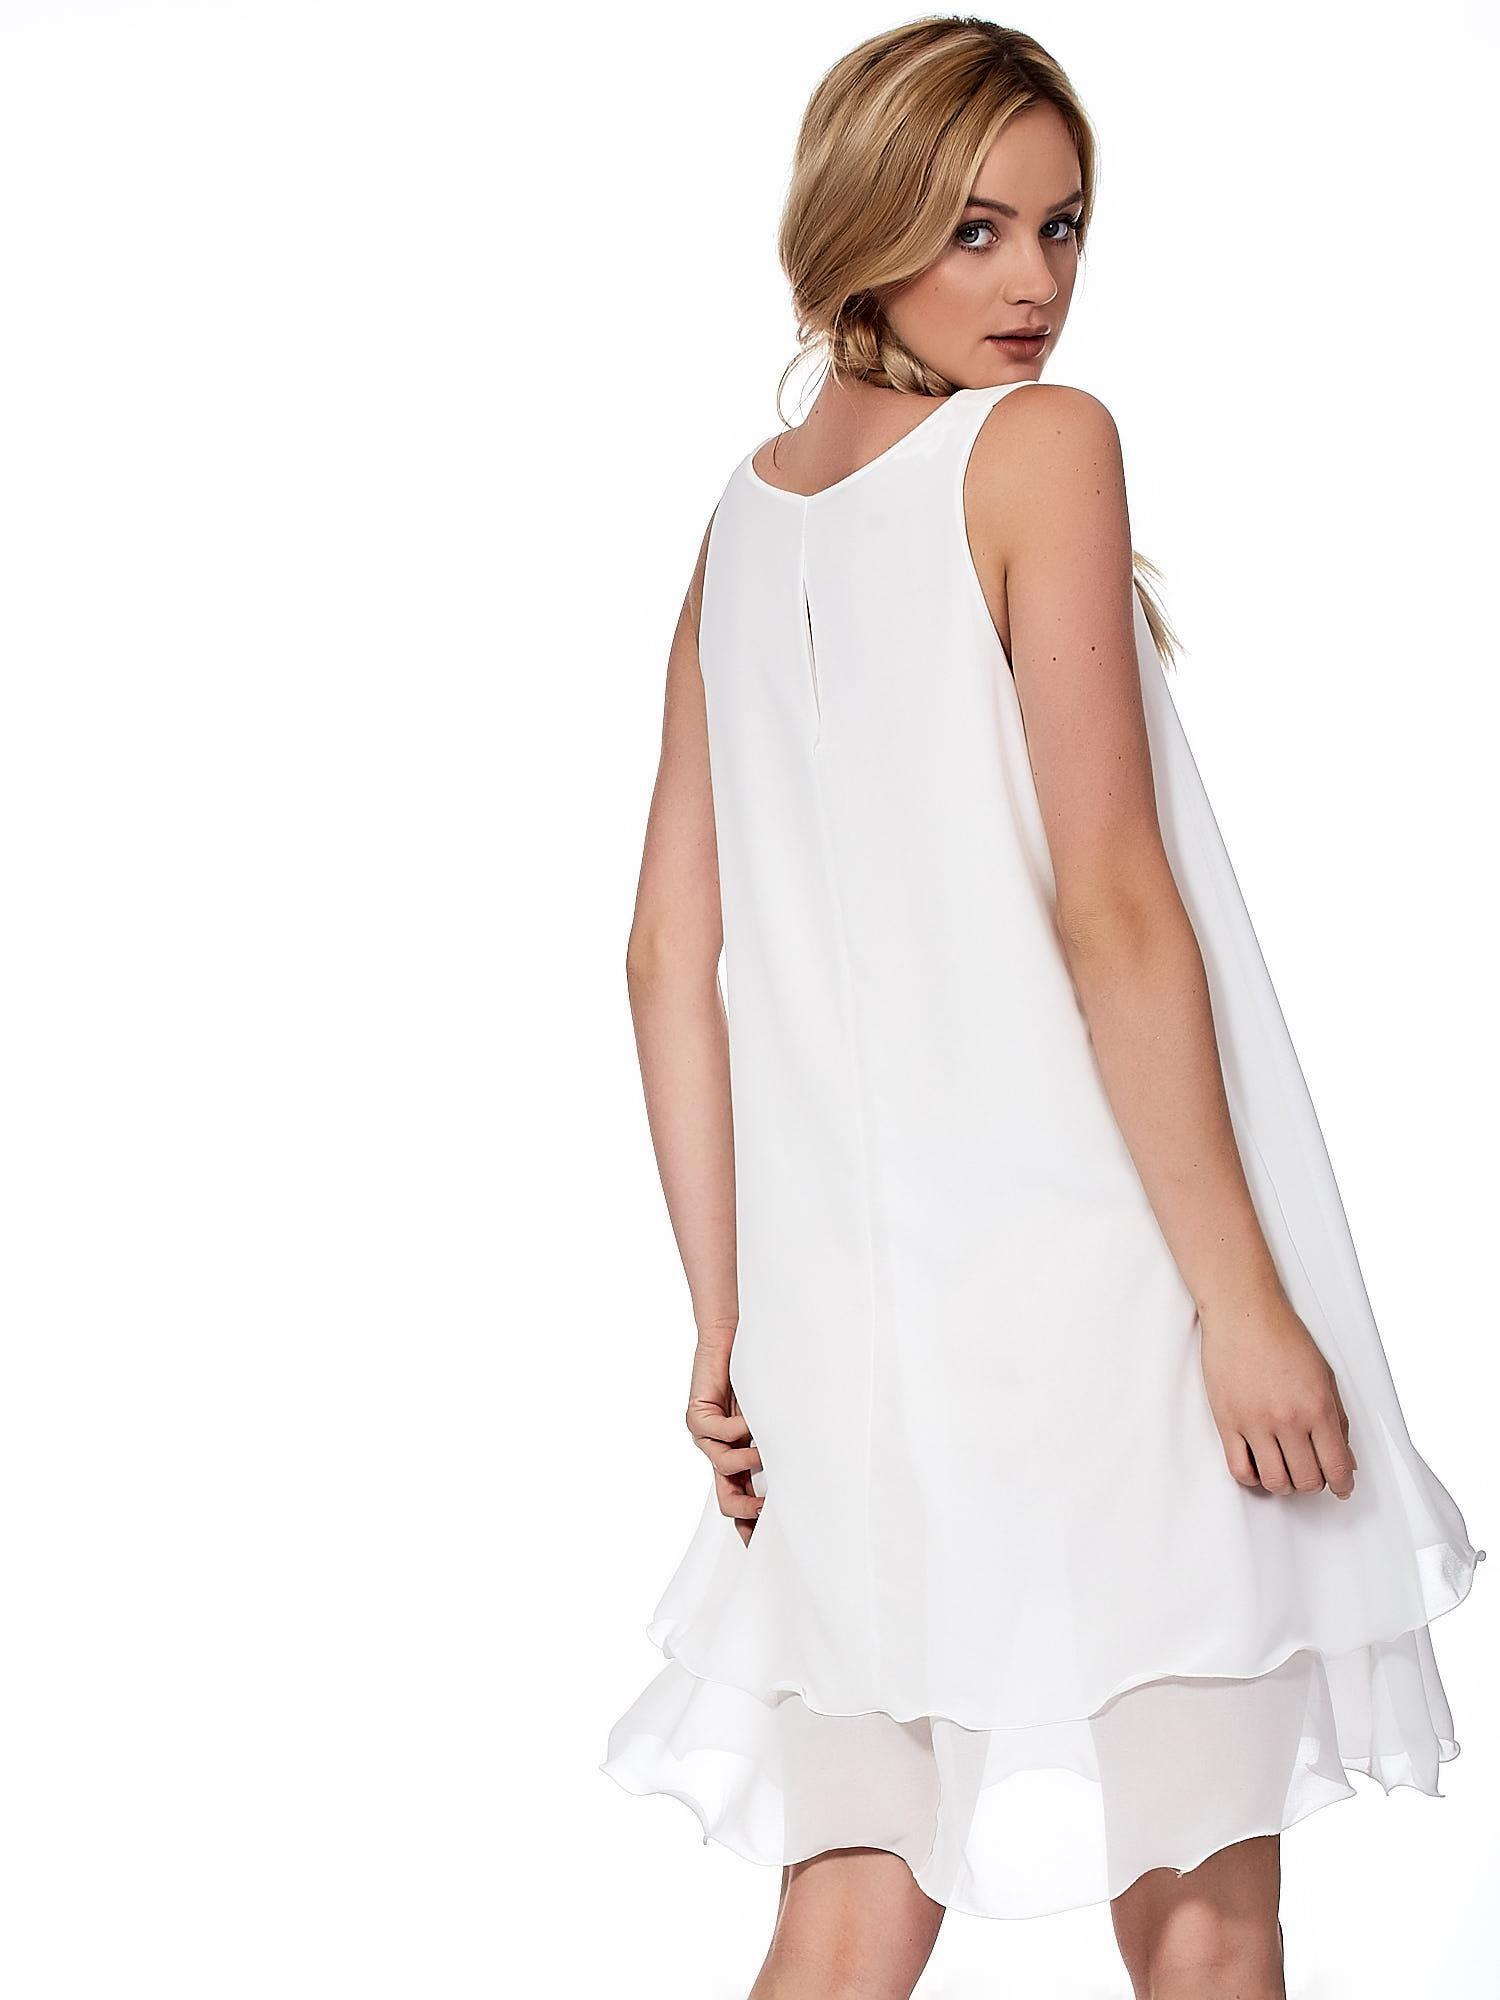 1f0c8d2d50 Biała zwiewna sukienka o luźnym kroju - Sukienka koktajlowa - sklep  eButik.pl